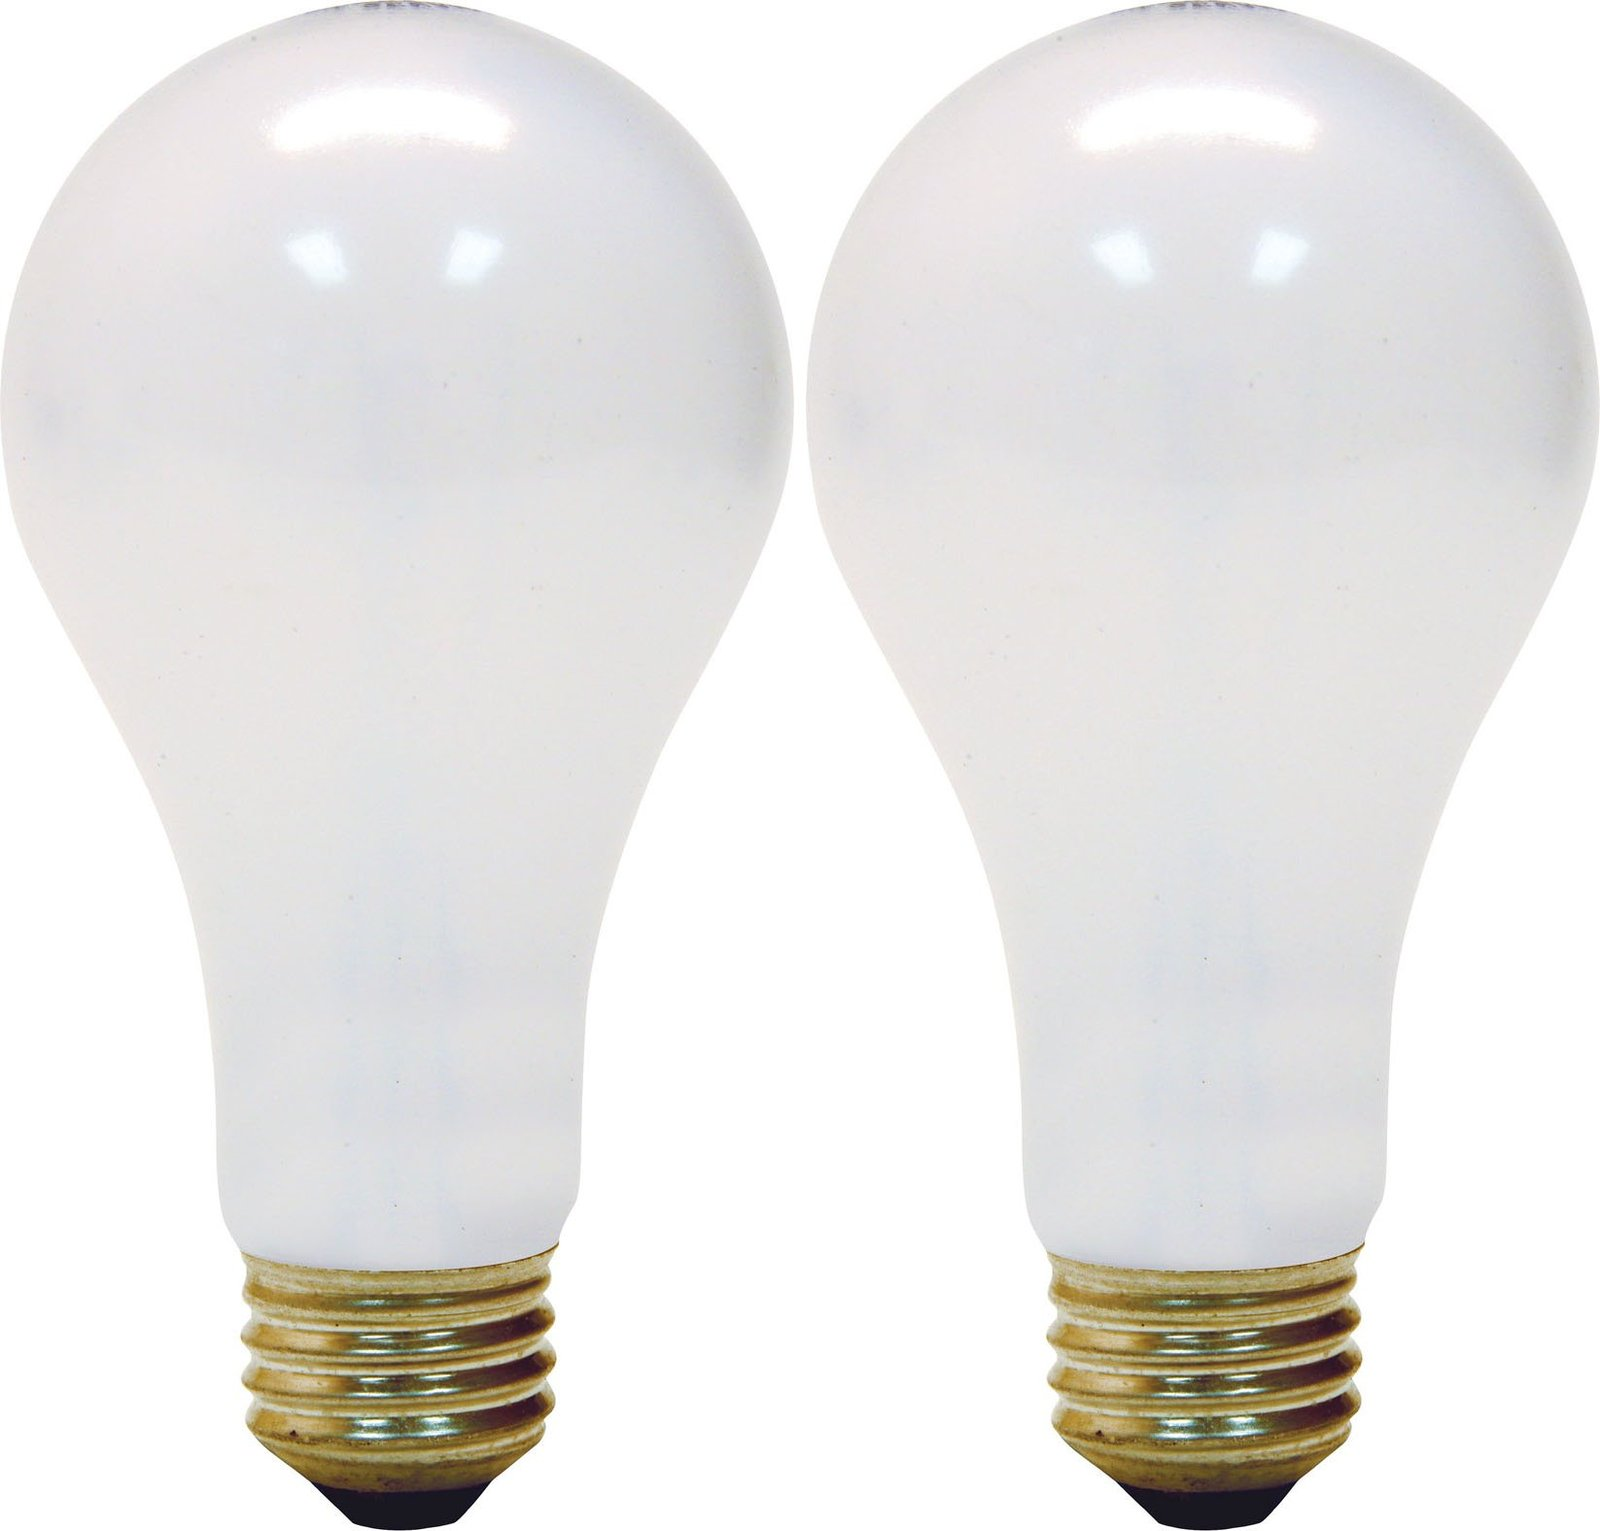 Pack Of 2 Ge 23100 Led Cam Light Bulb 300 Lumens Clear 40 Watts Soft White